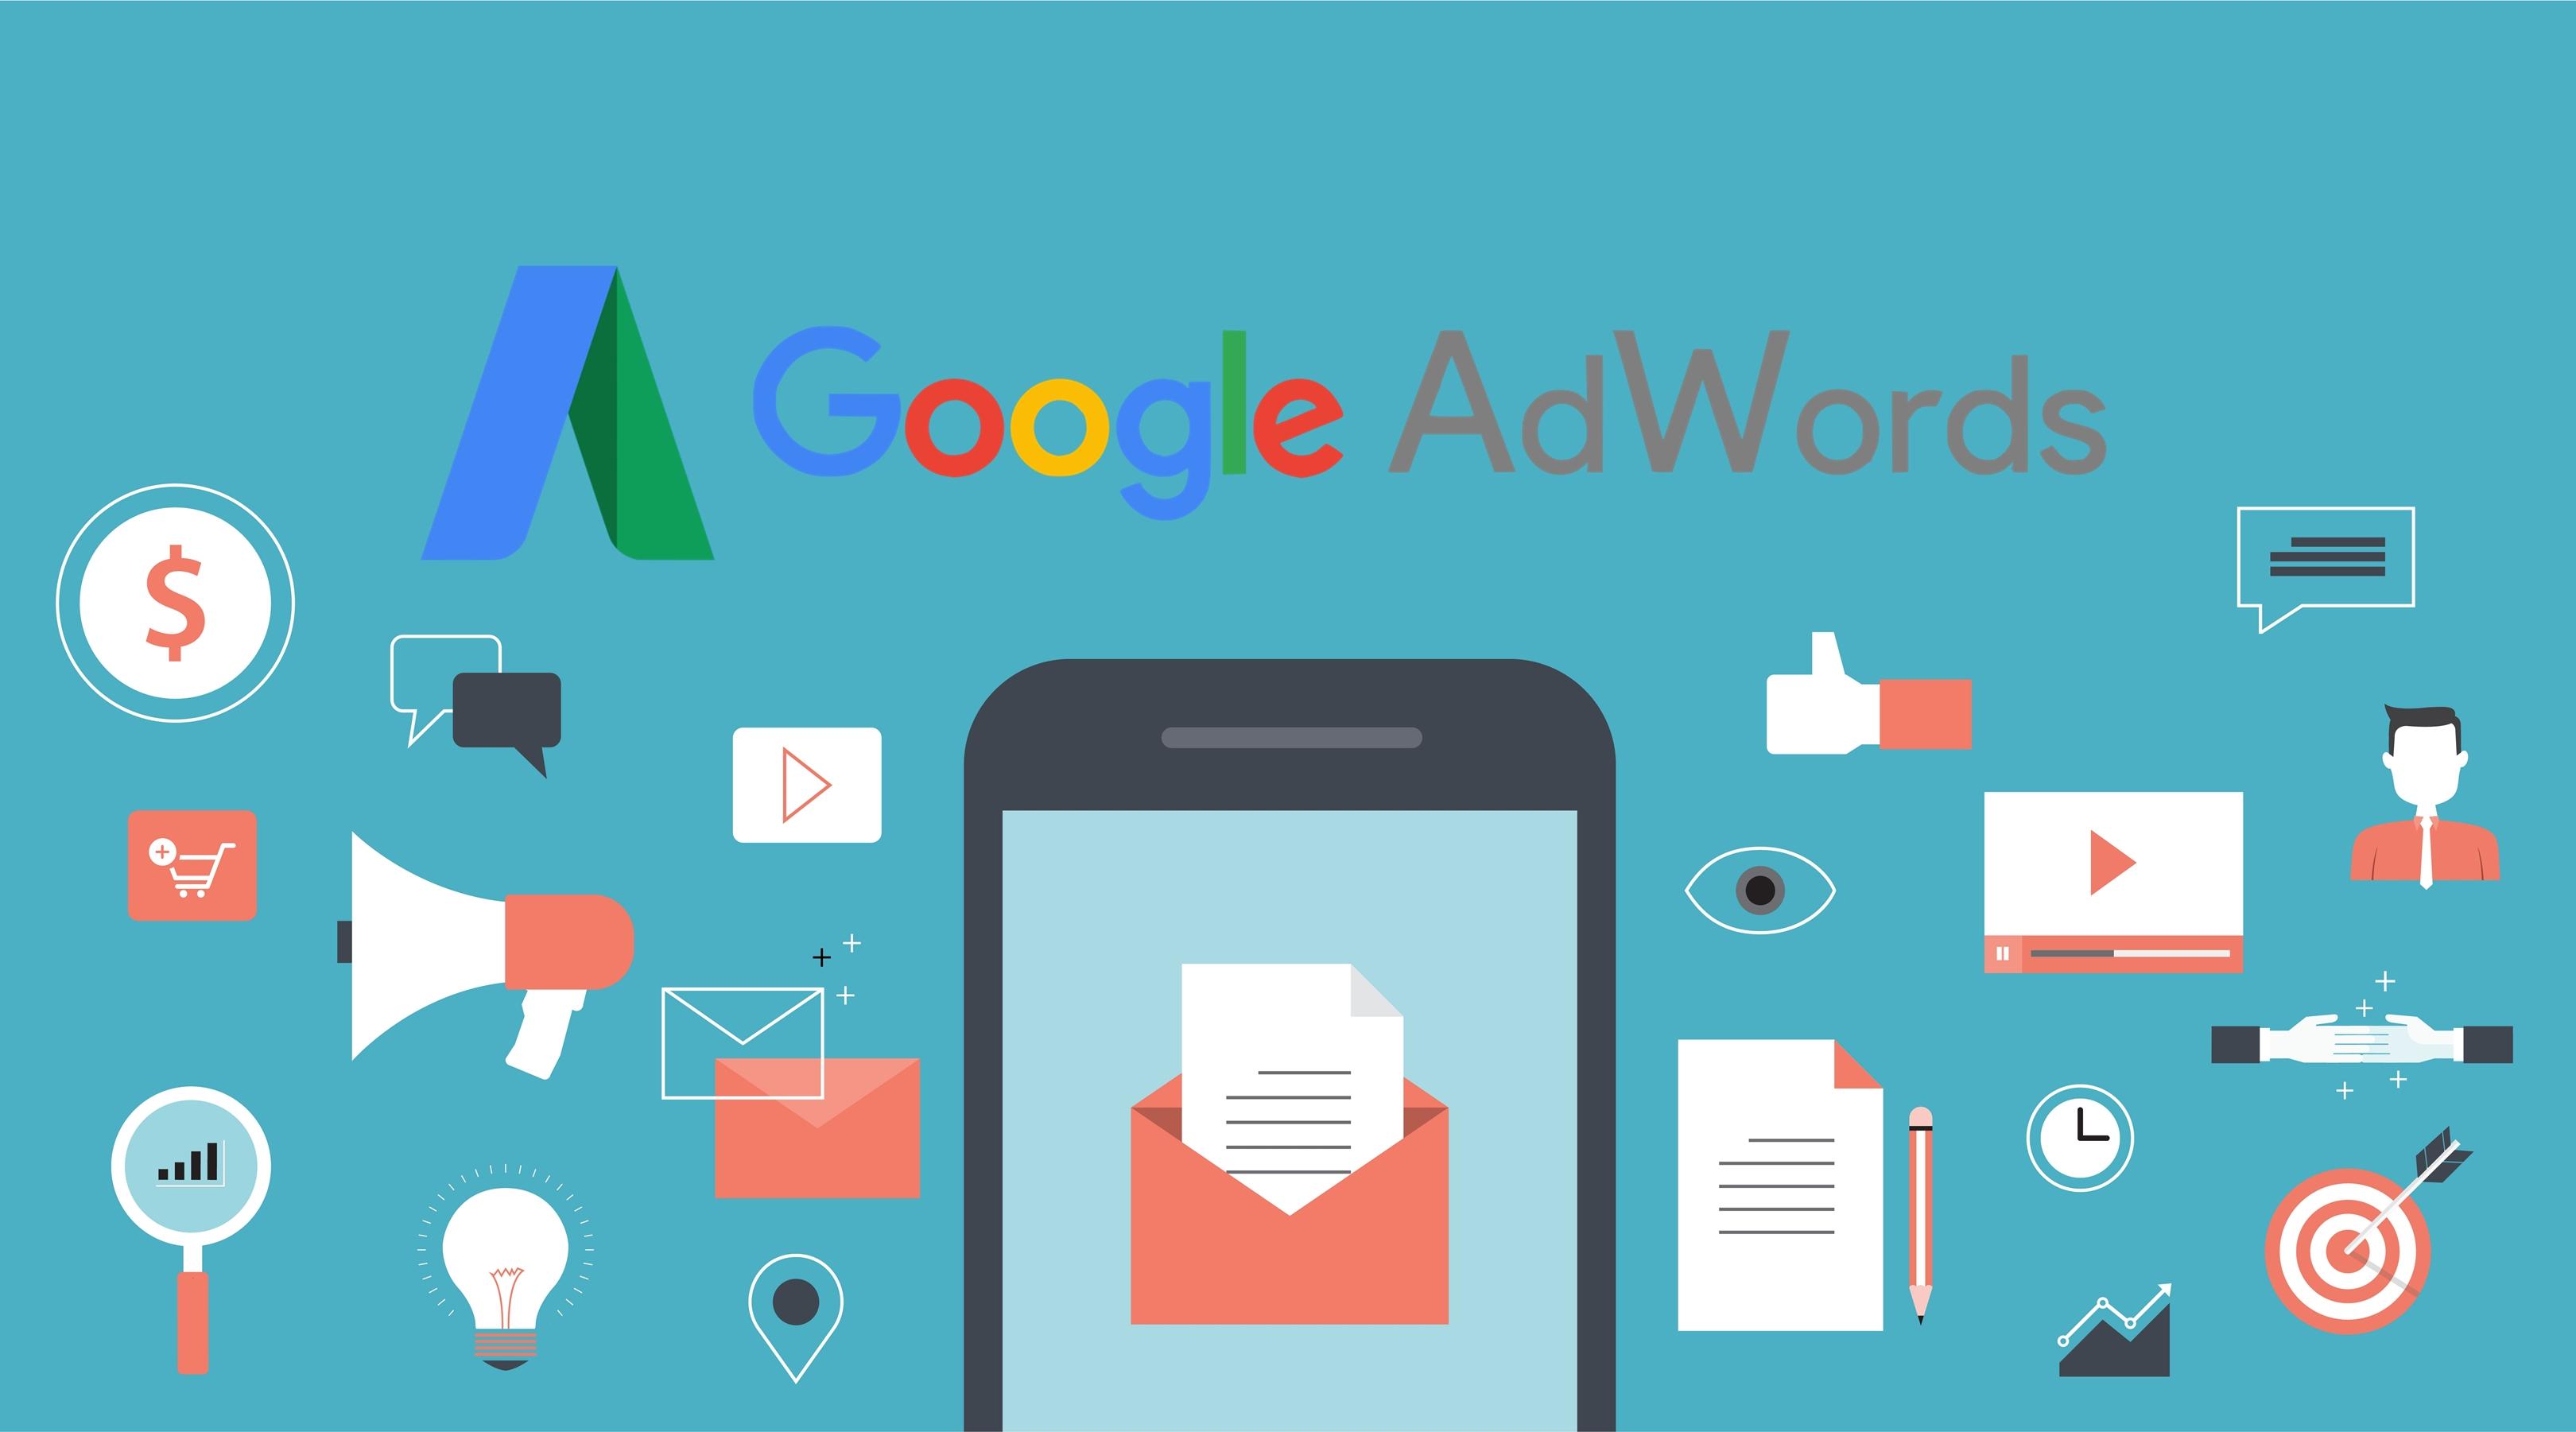 Google Adwords แบบใหม่